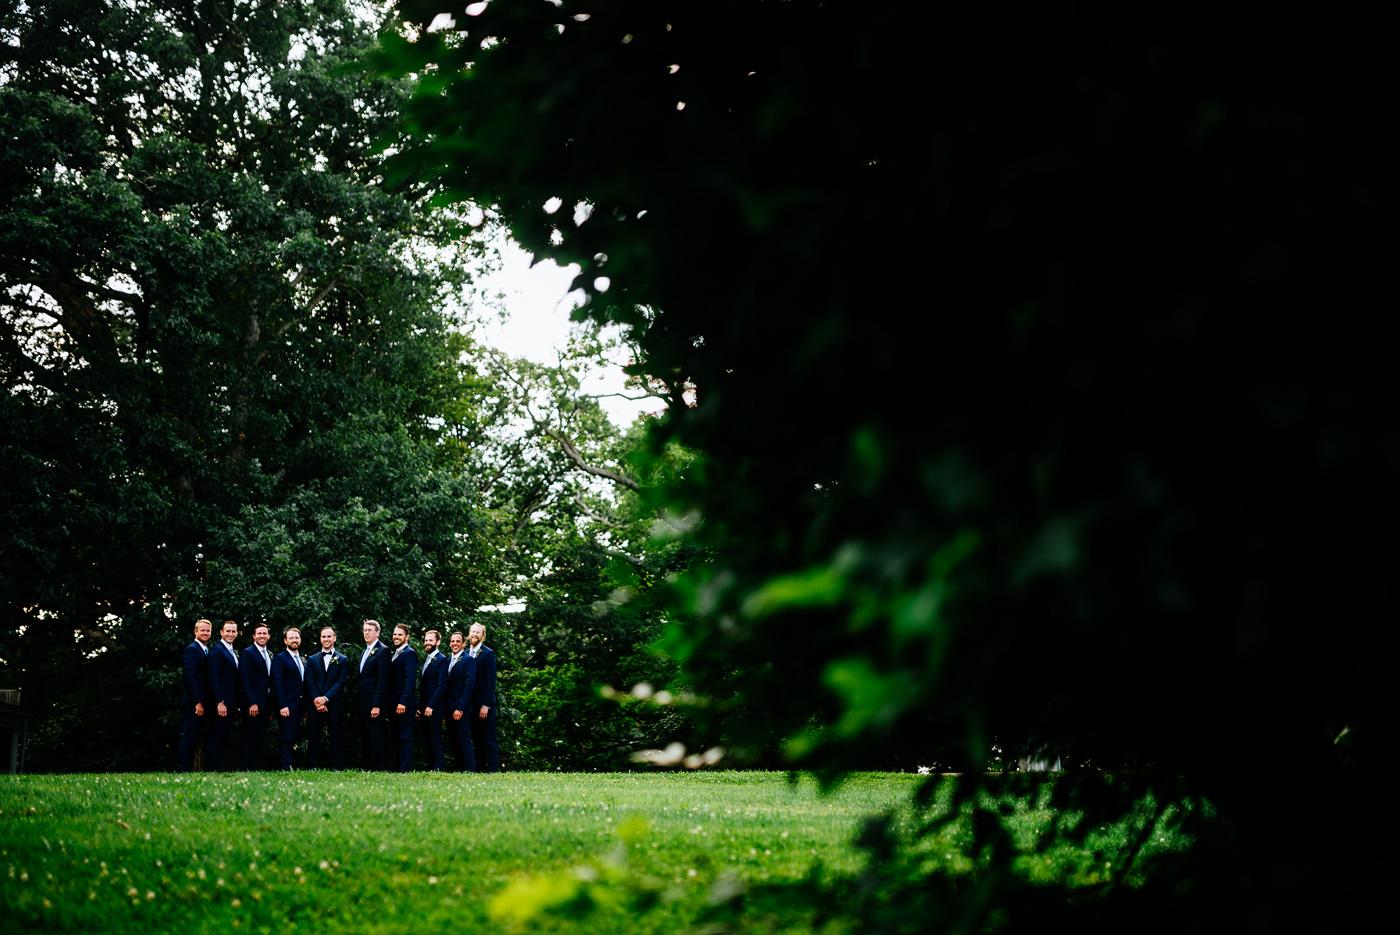 lewisburg wv outdoor wedding ceremony at tuscawilla farm